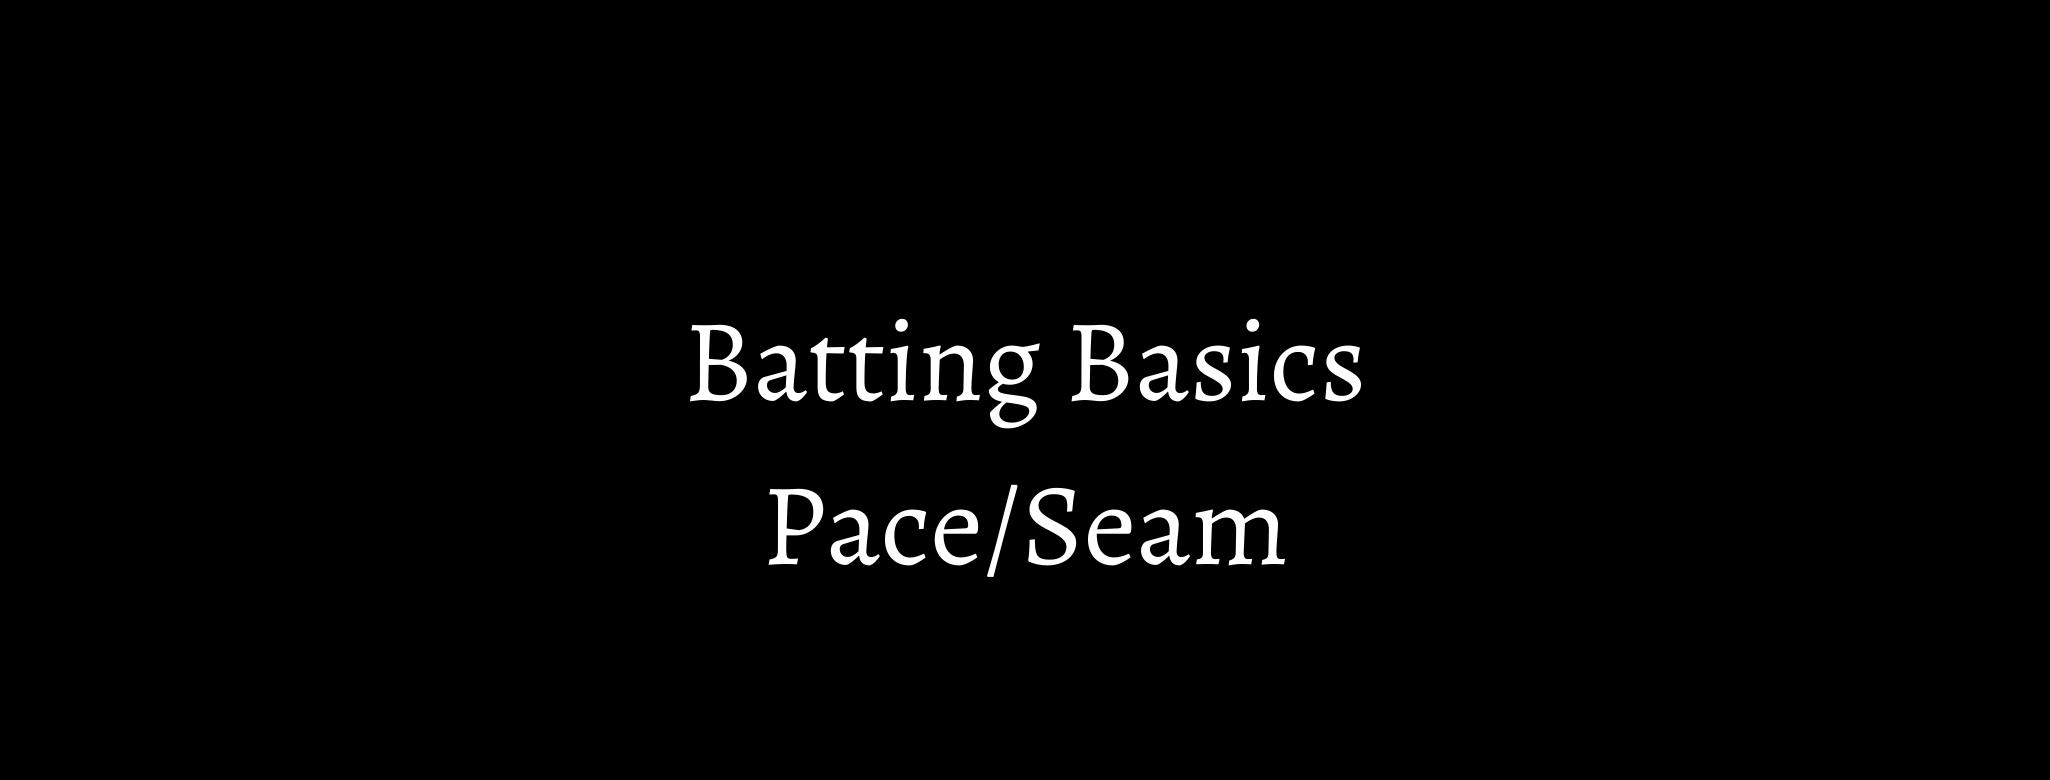 Batting Basis: Playing Pace/Seam